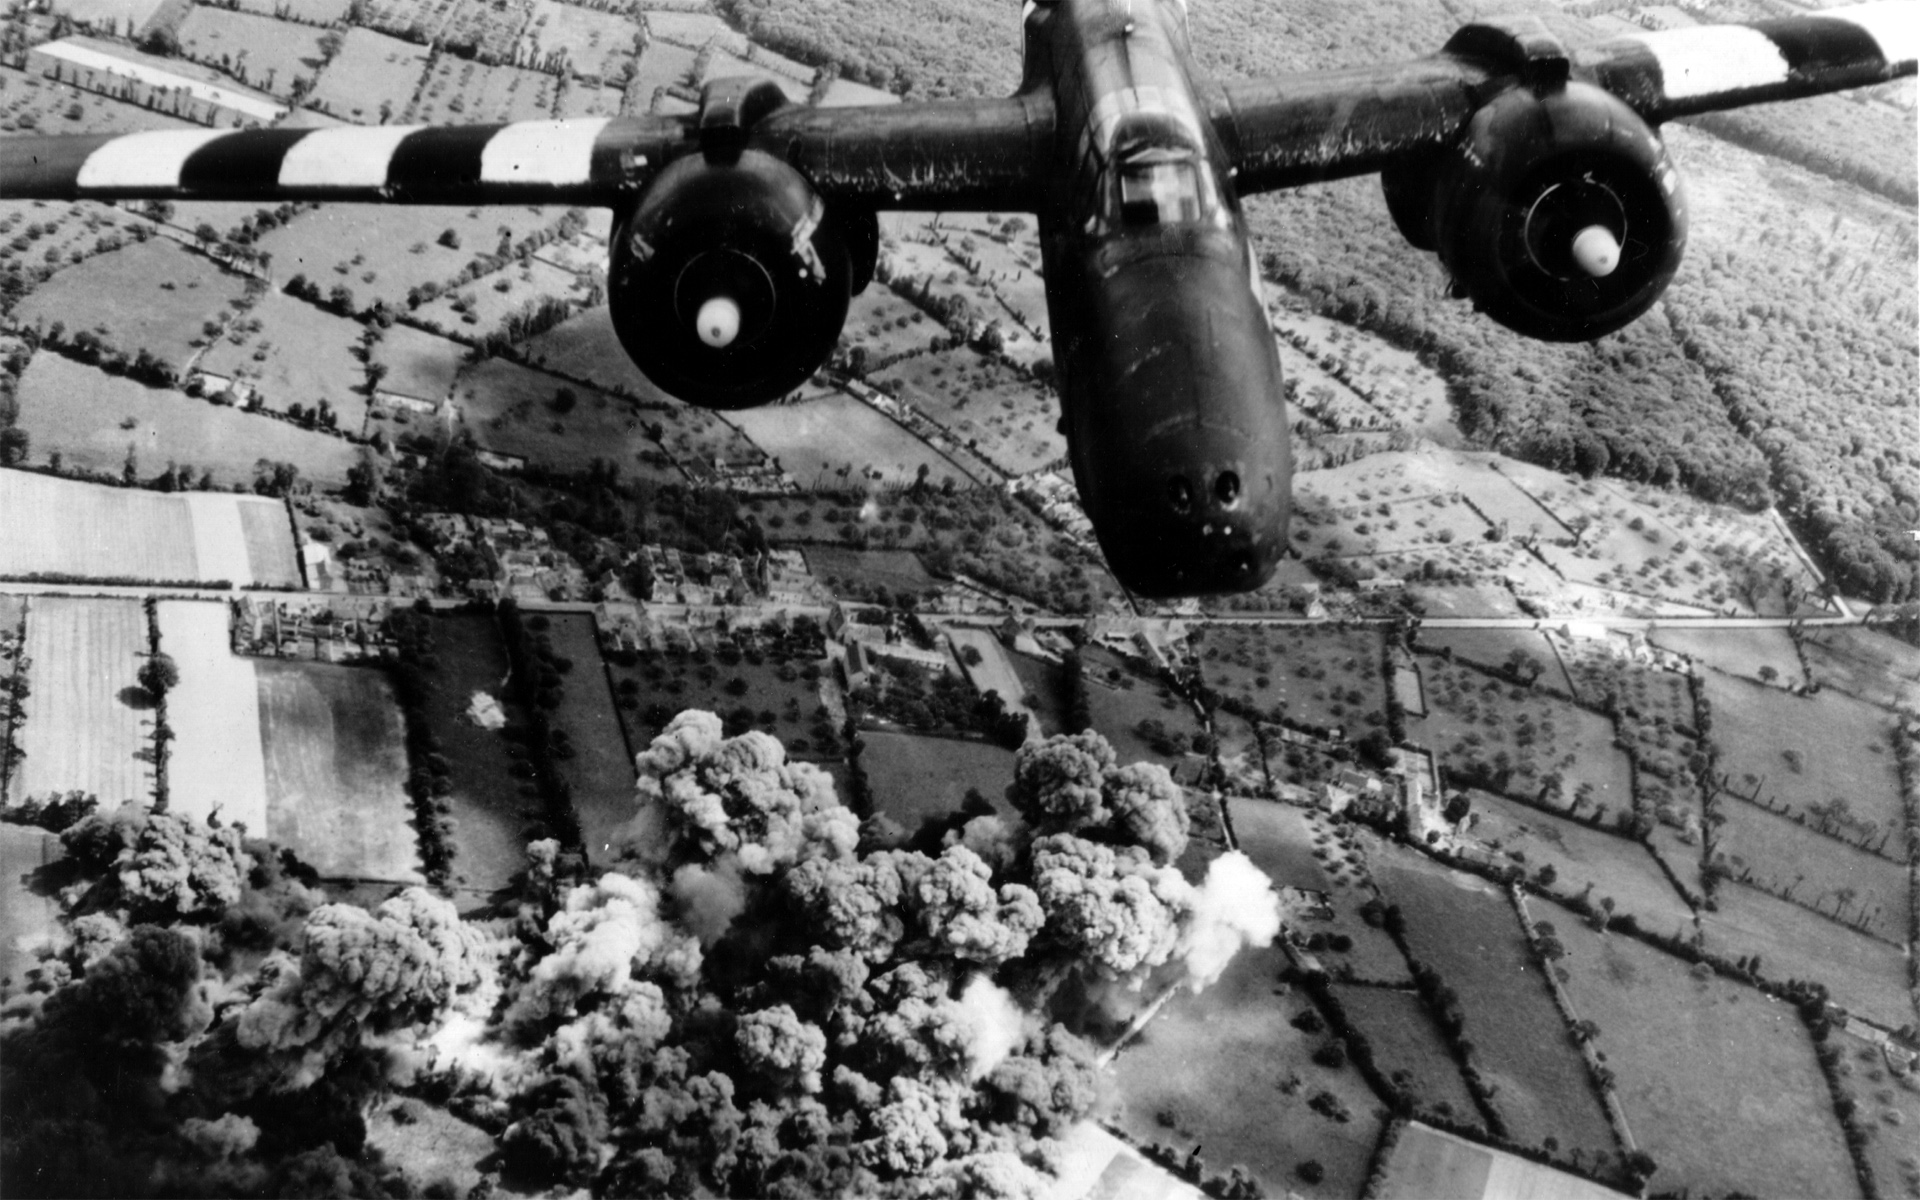 Bomber History Wallpaper 1920x1200 Bomber History World War II 1920x1200